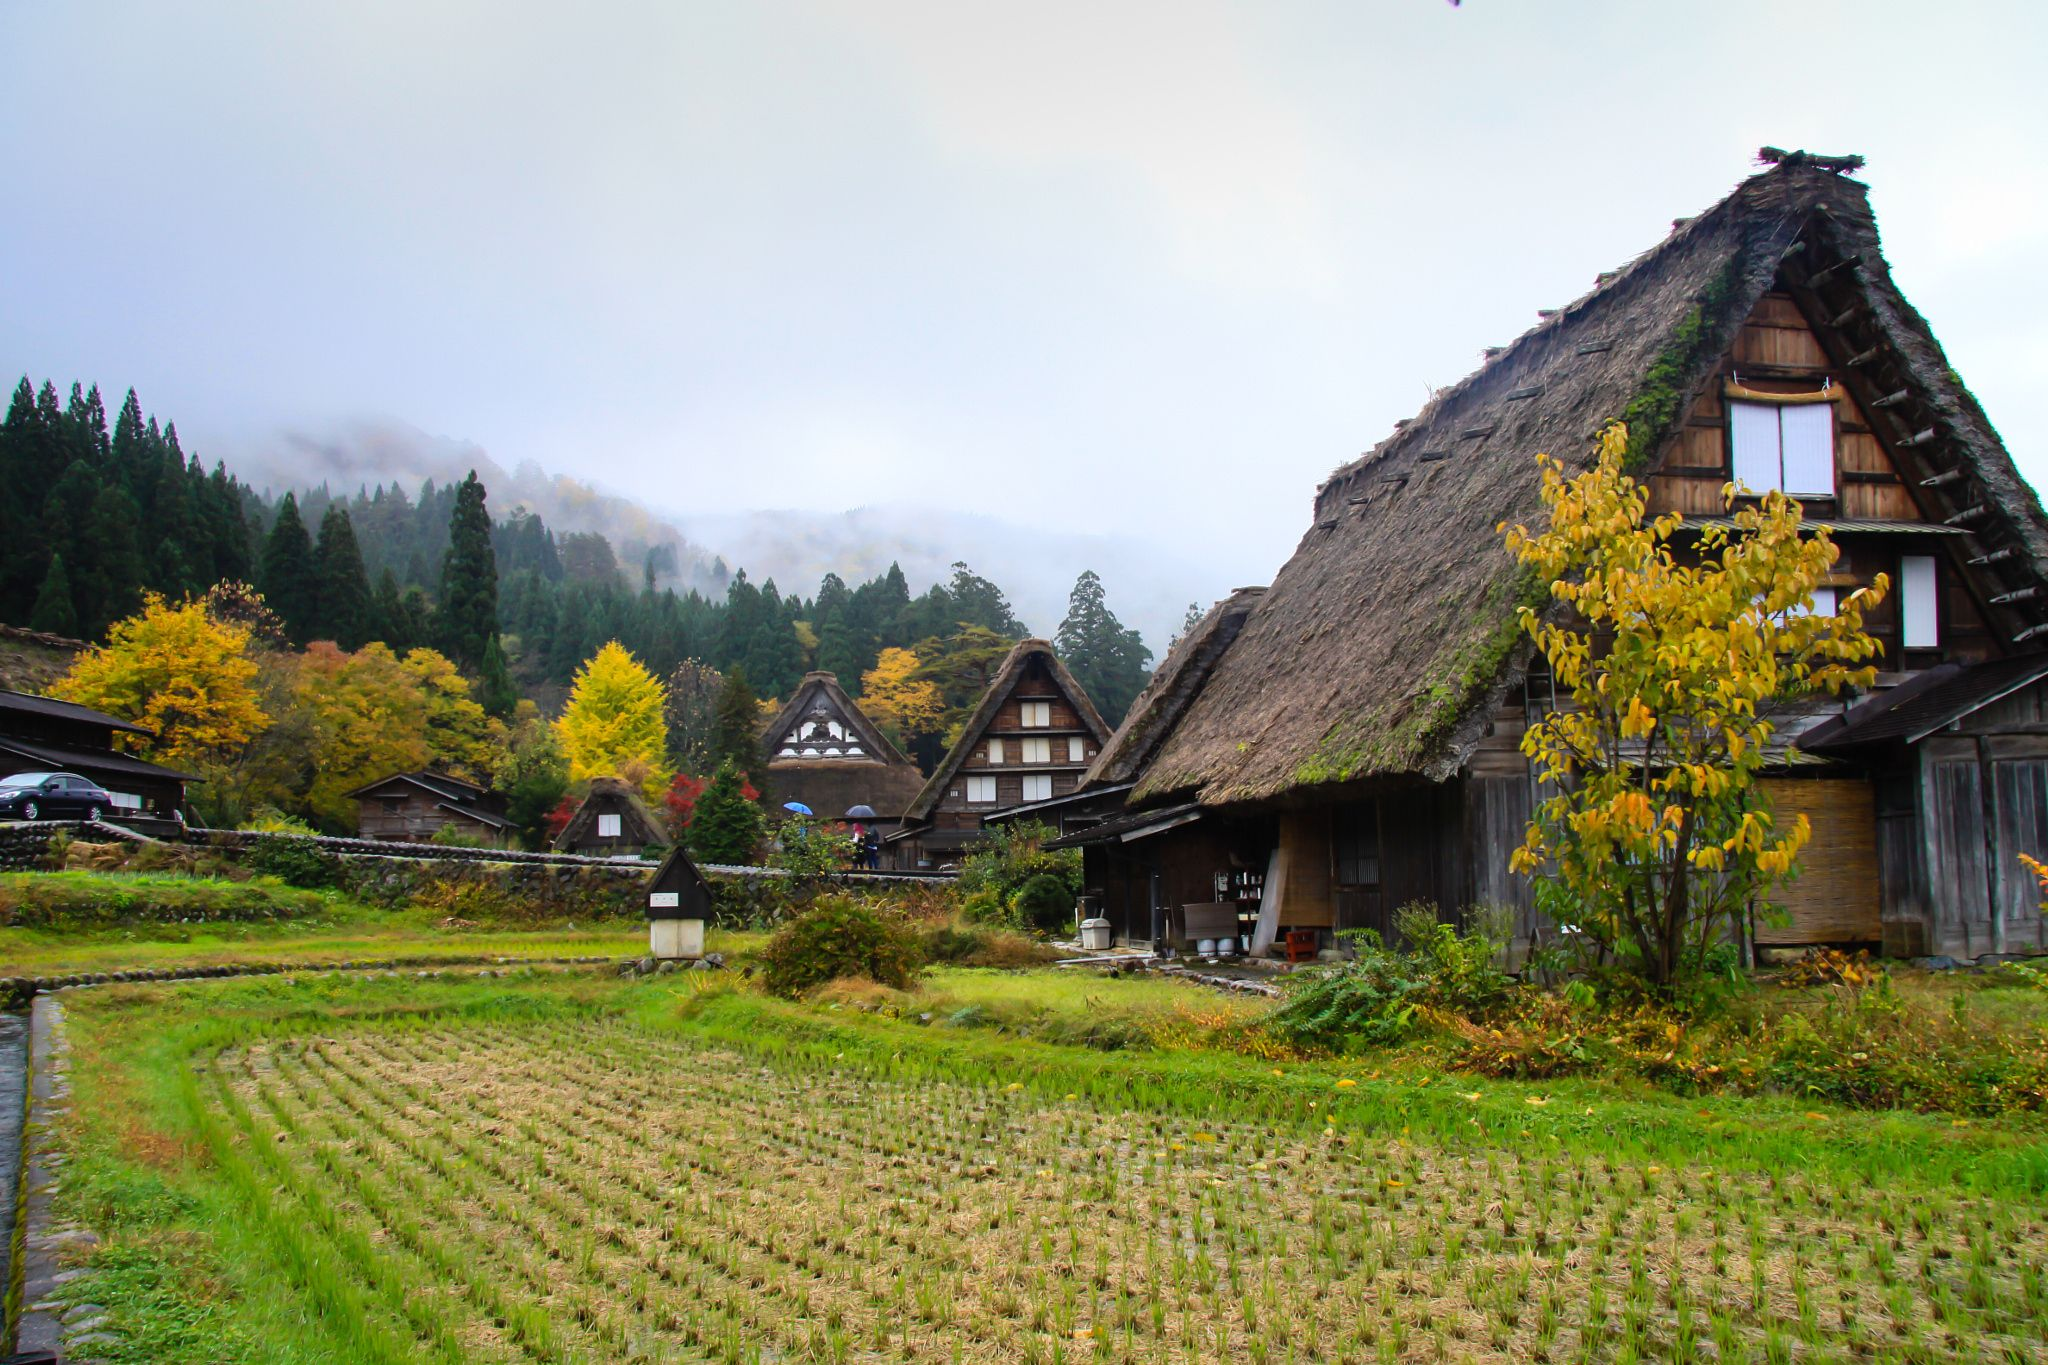 Shirakawa-go village, a world heritage by Hoang Nguyen on 500px